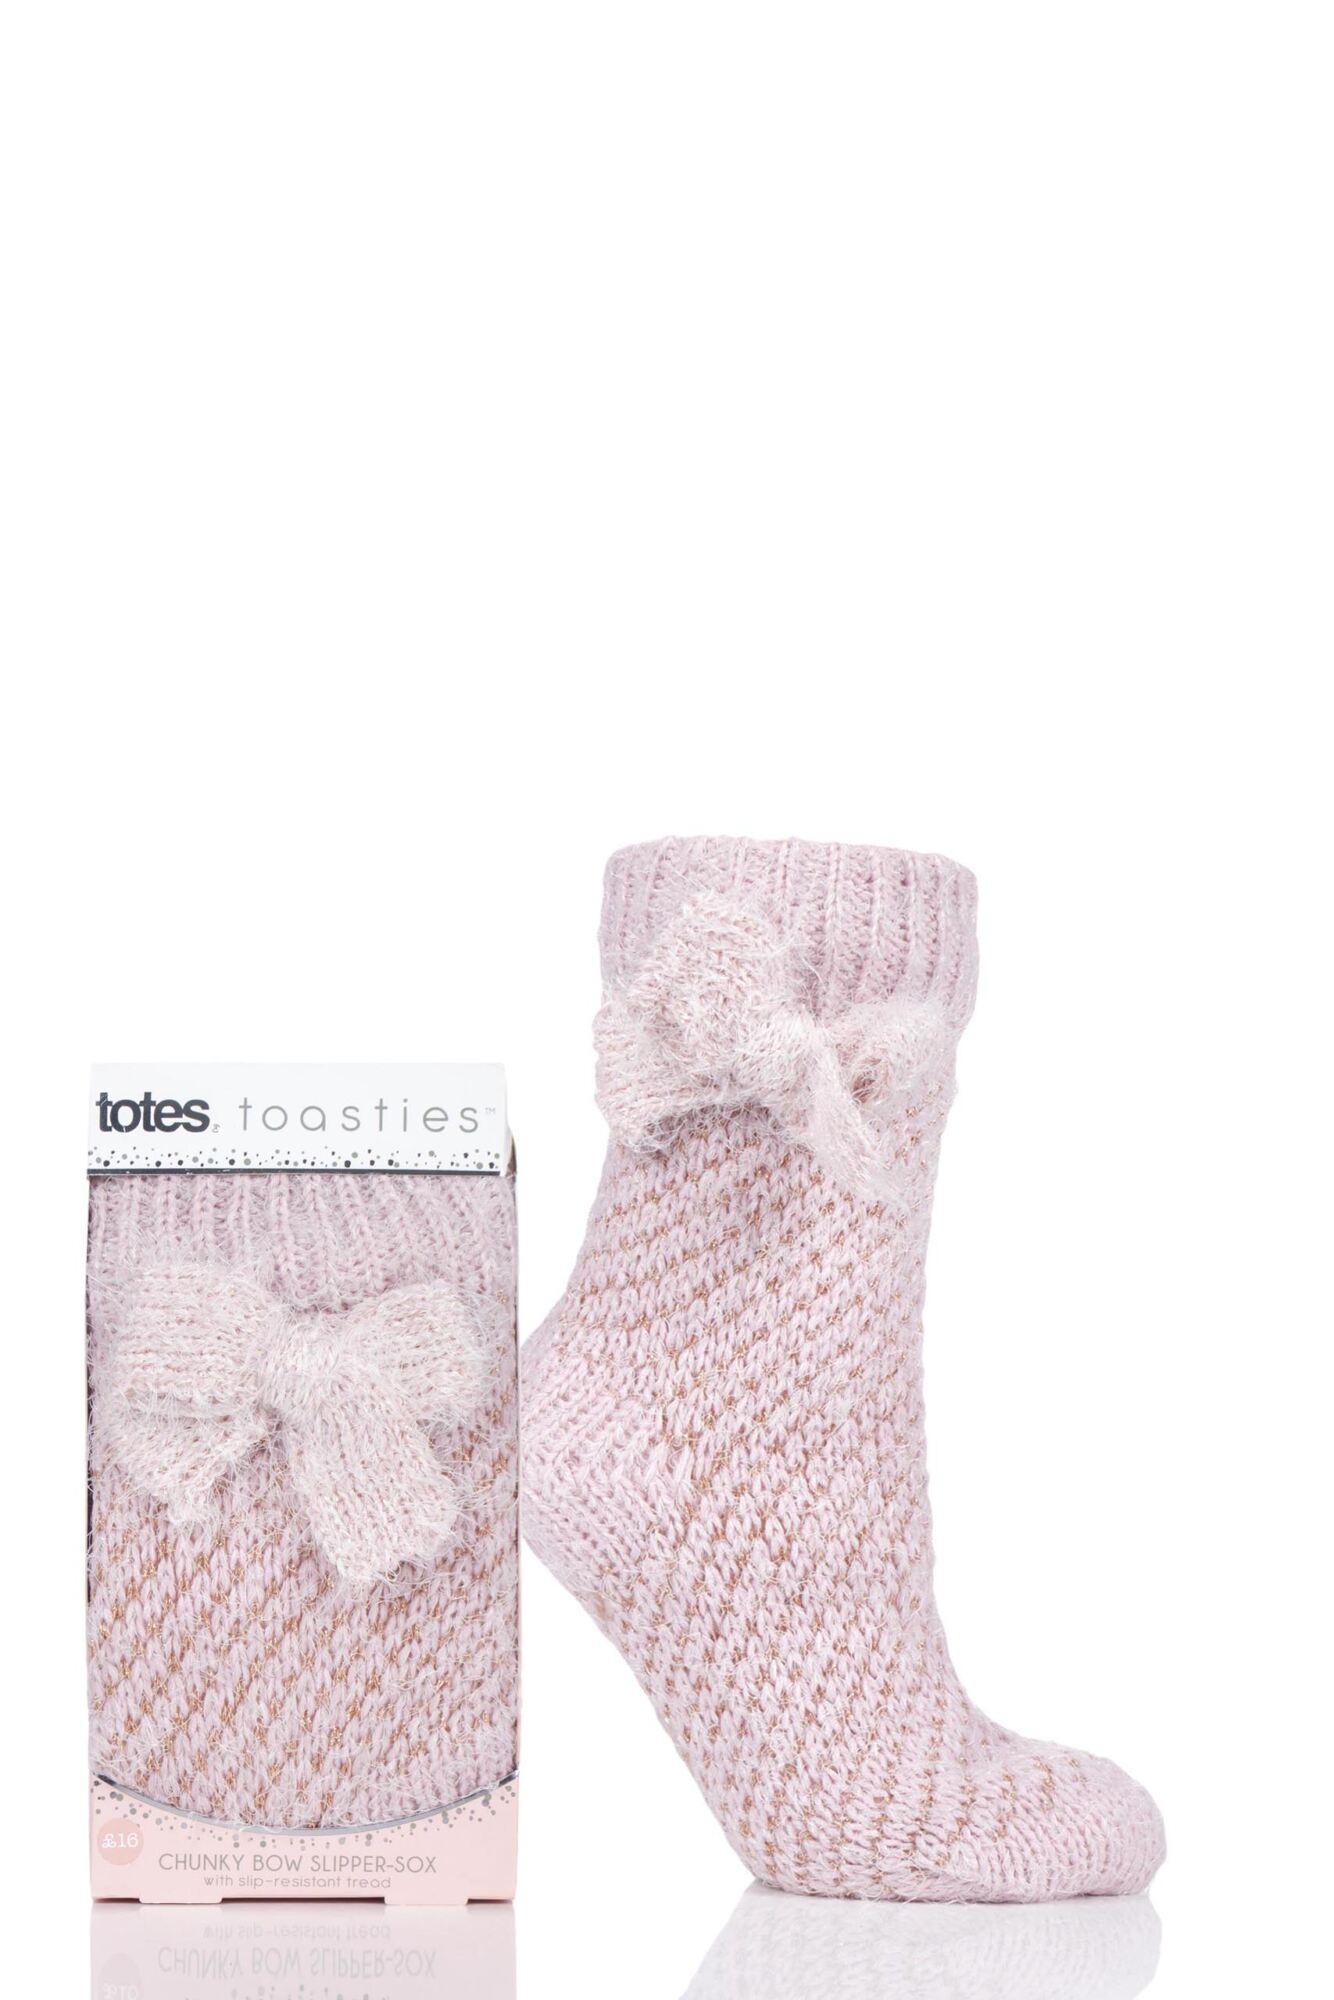 1 Pair Bow Sparkle Chunky Knit Socks Ladies - Totes